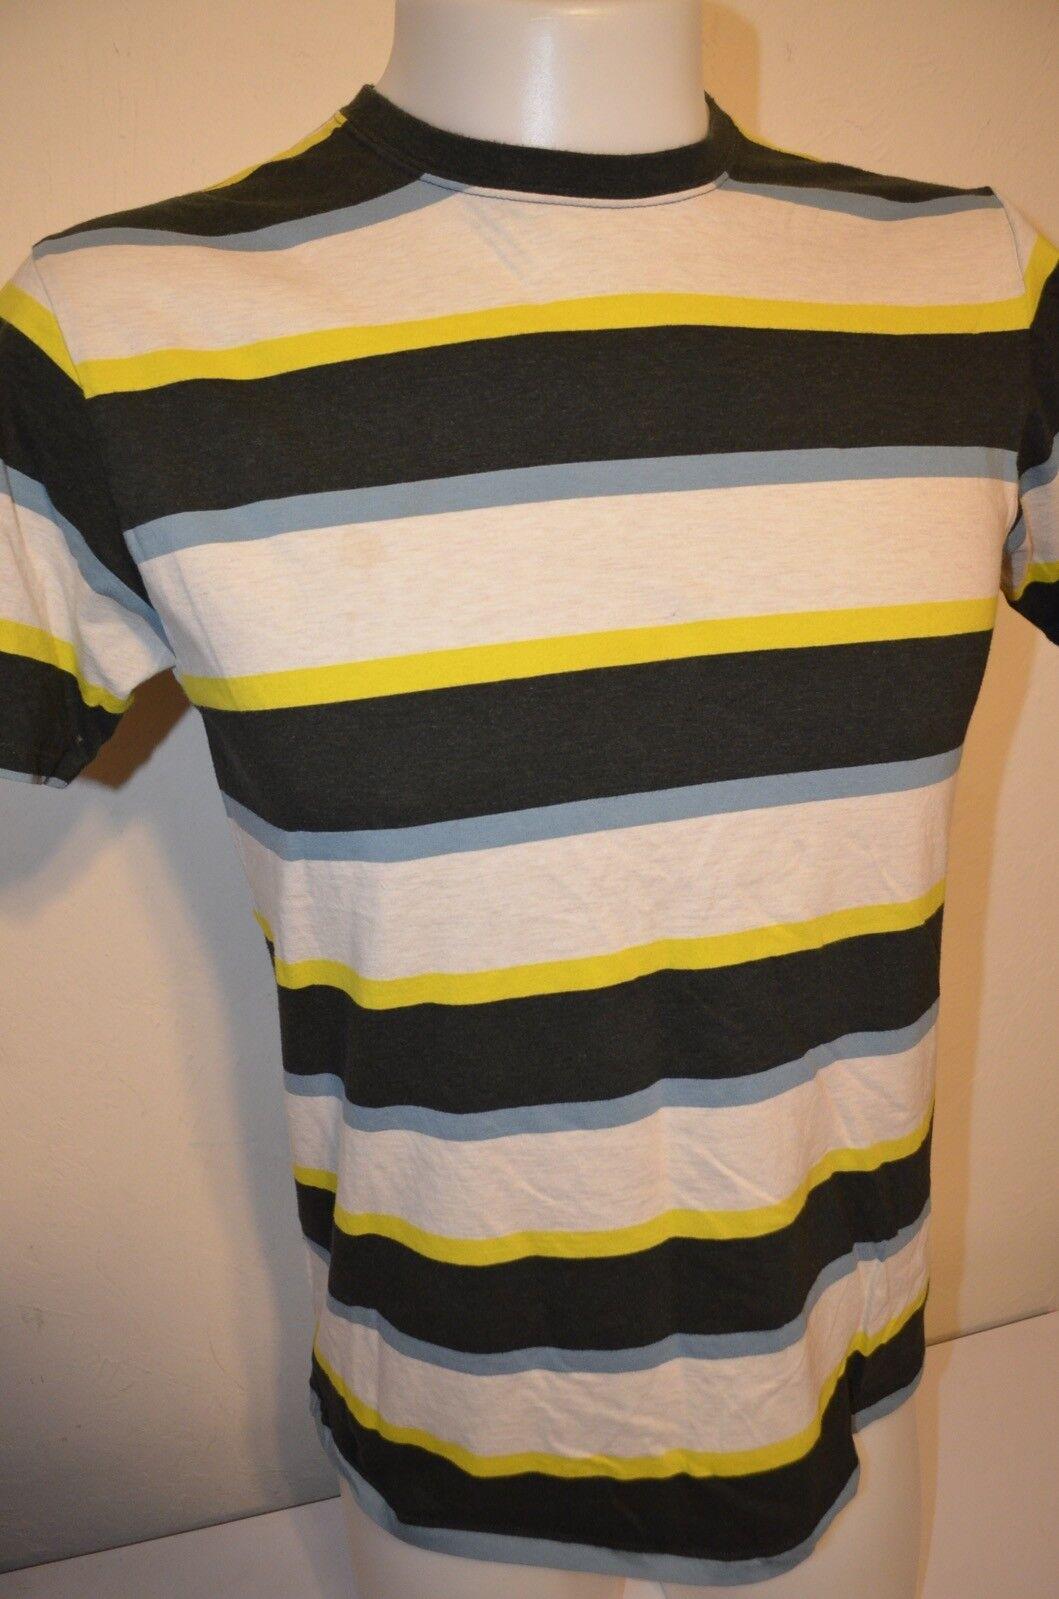 Patagonia Blau Gelb Striped 100% Organic Cotton Soft Thin  Herren M T-Shirt EUC